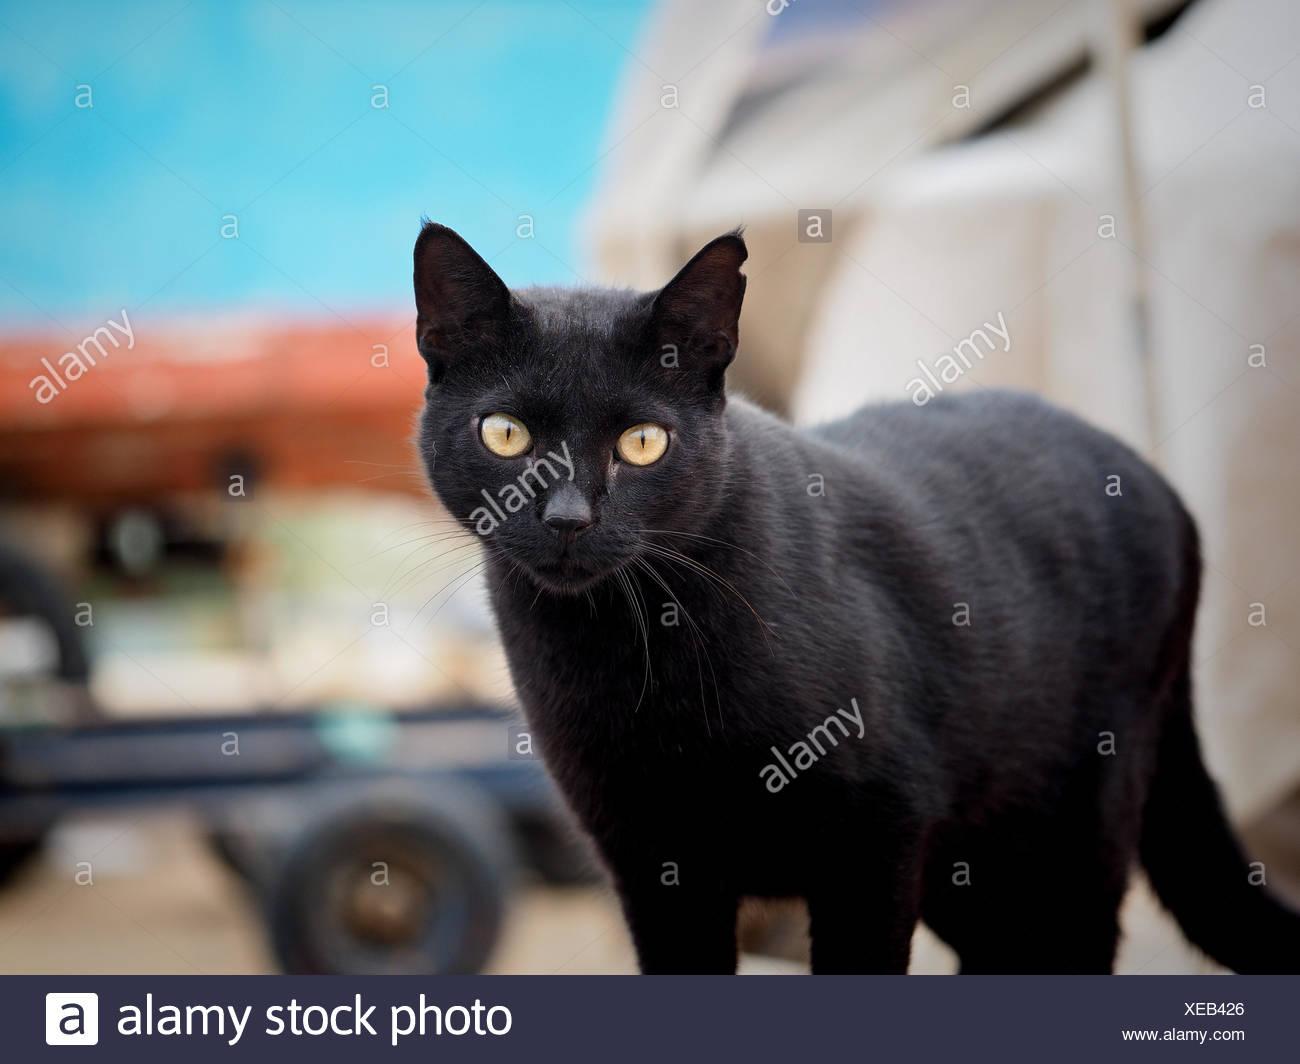 Portrait Of Black Cat Outdoors - Stock Image